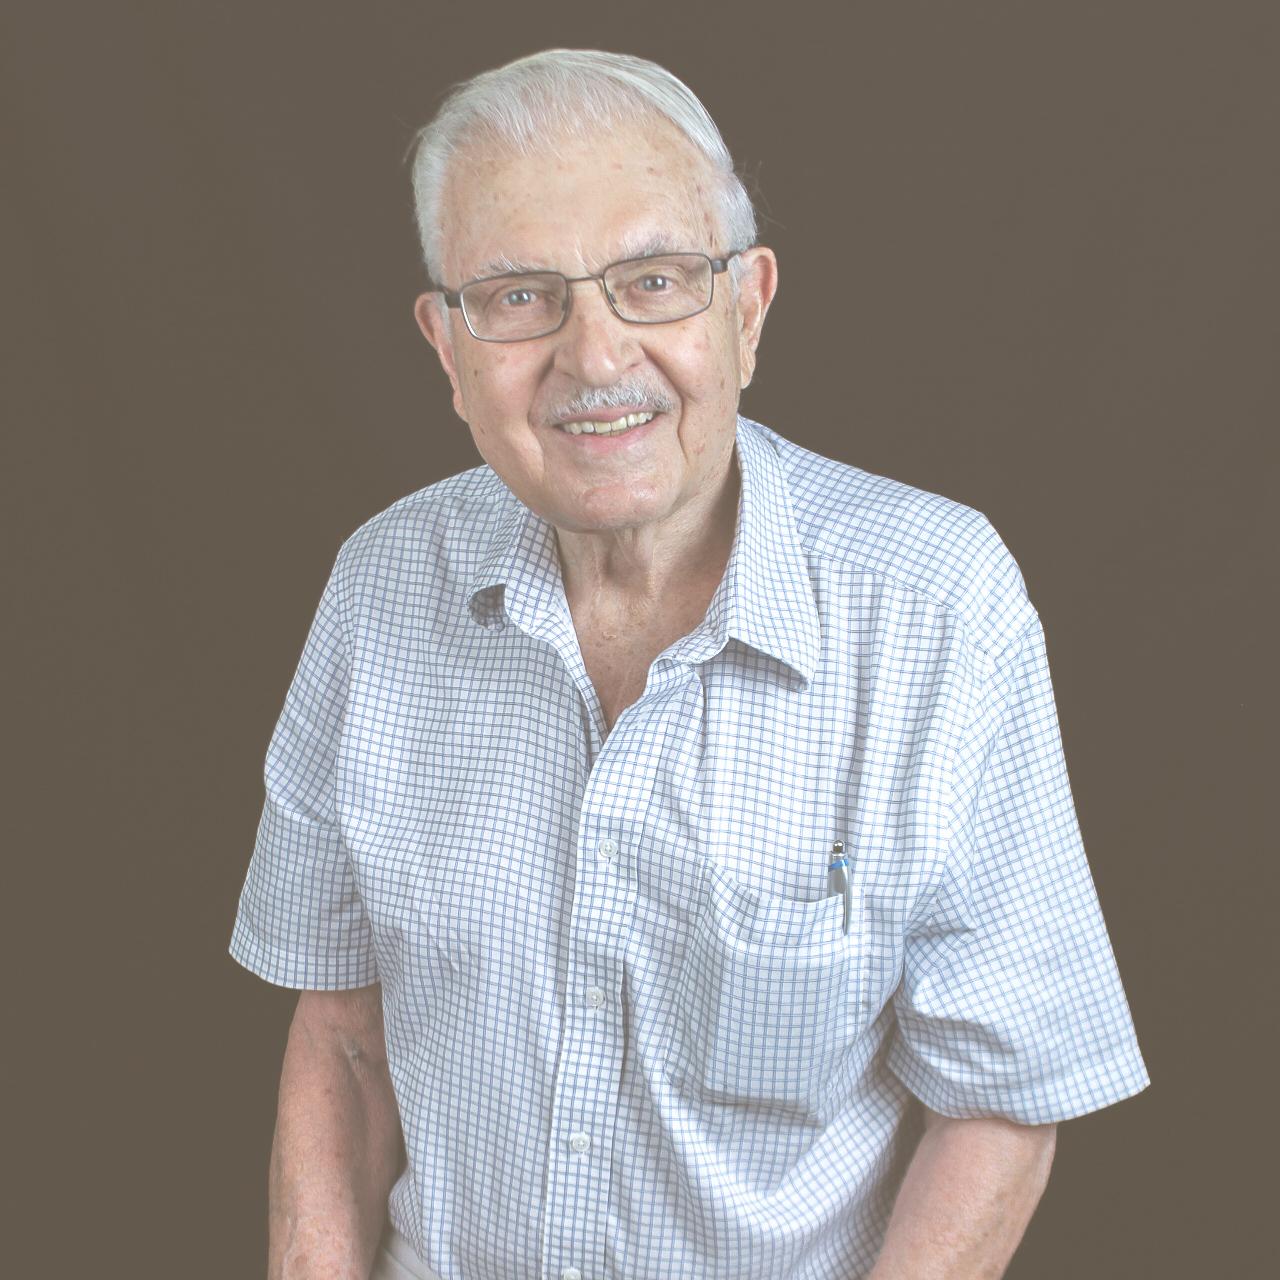 Neil Kuns   10:30am - 12pm  Seniors  Adult Sunday School - Ongoing